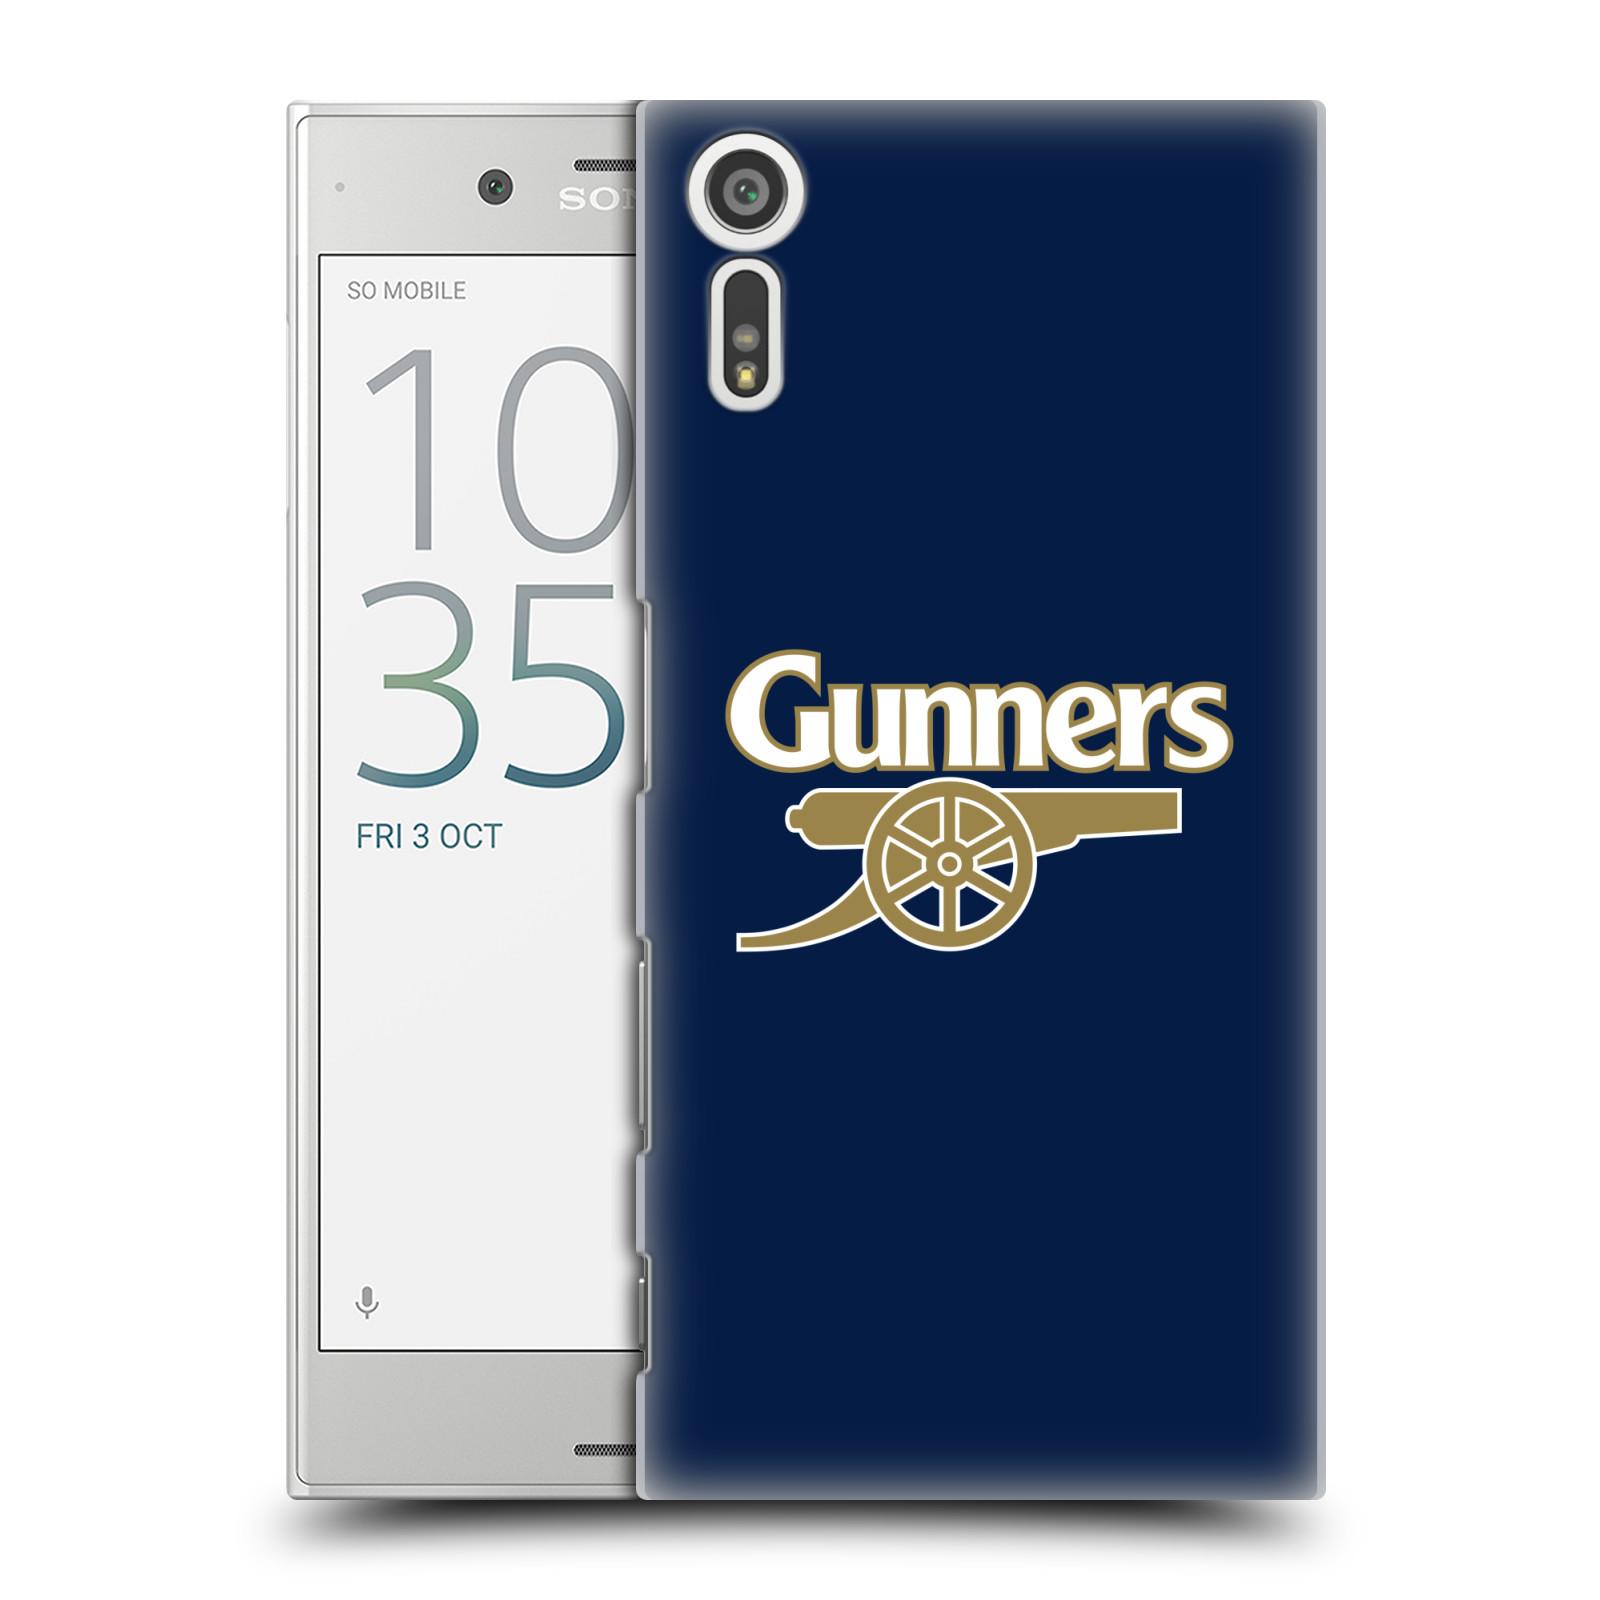 Plastové pouzdro na mobil Sony Xperia XZ - Head Case - Arsenal FC - Gunners